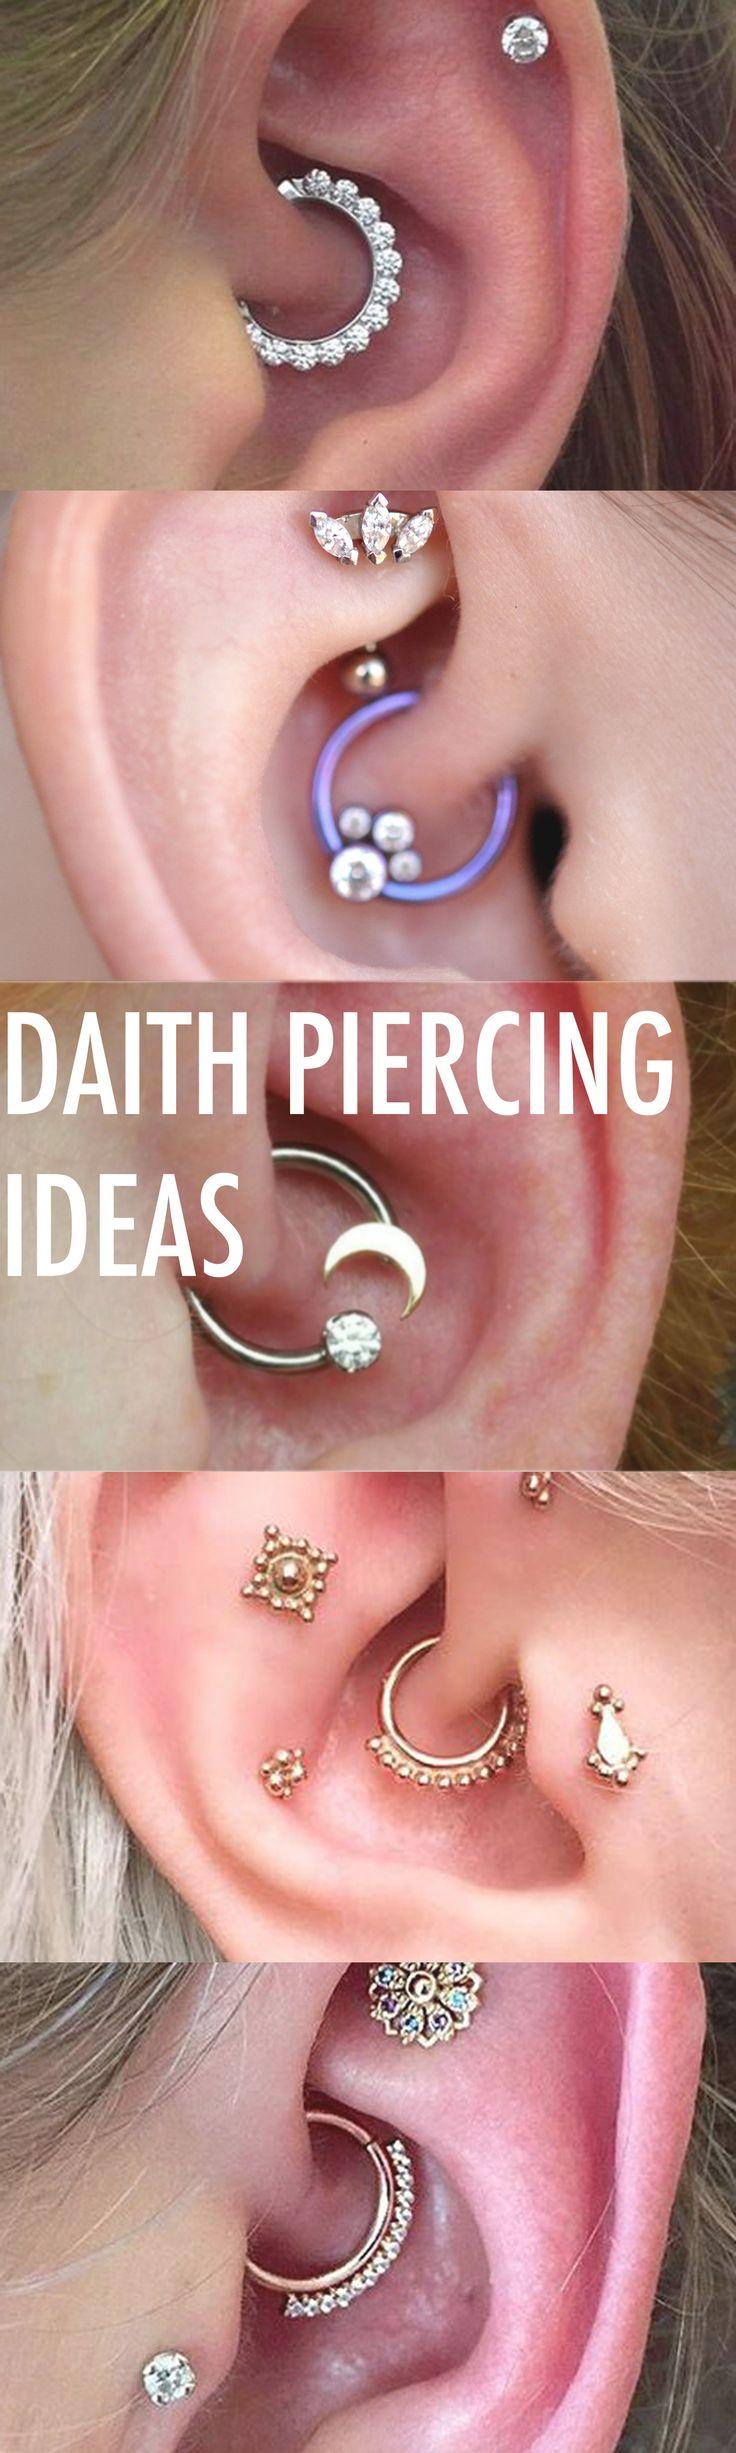 Creative Multiple Ear Piercing Ideas Combinations at MyBodiArt.com - Crystal Daith Earring Ring Hoop - Tragus Stud - Constellation Barbell - Triple Forward Helix